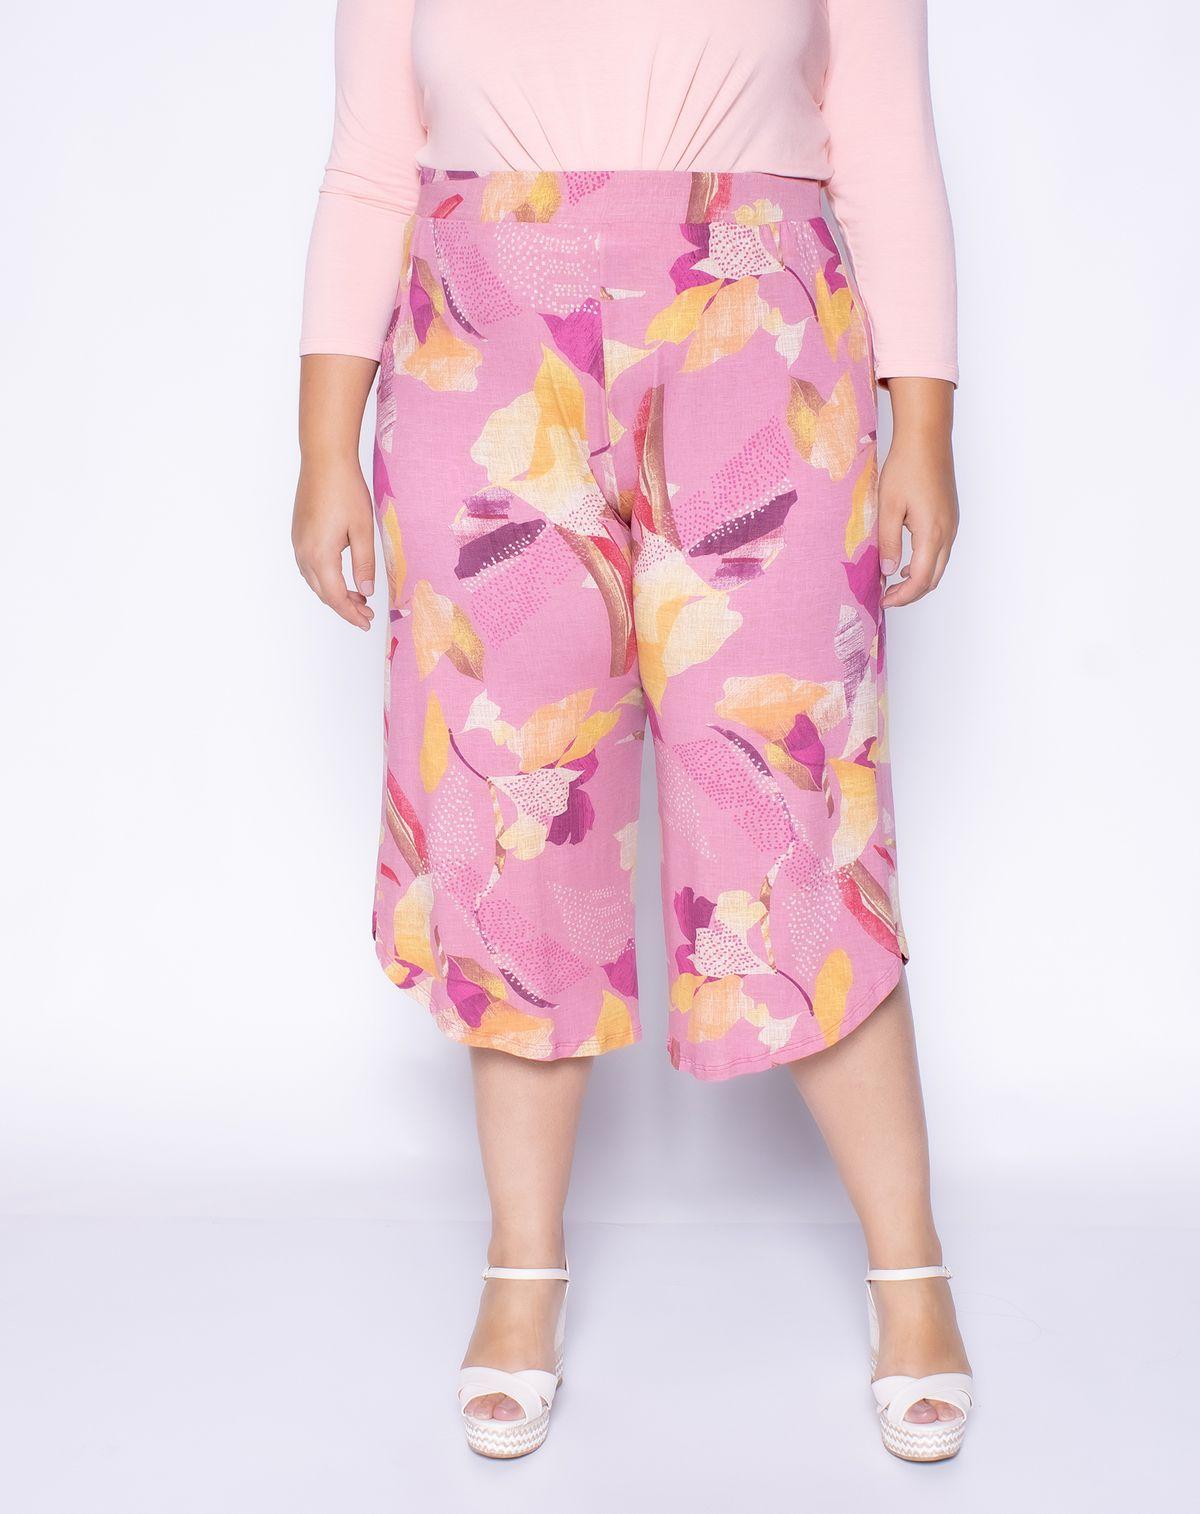 596681002-calca-pantacourt-plus-feminino-estampa-floral-rosa-g2-bbb